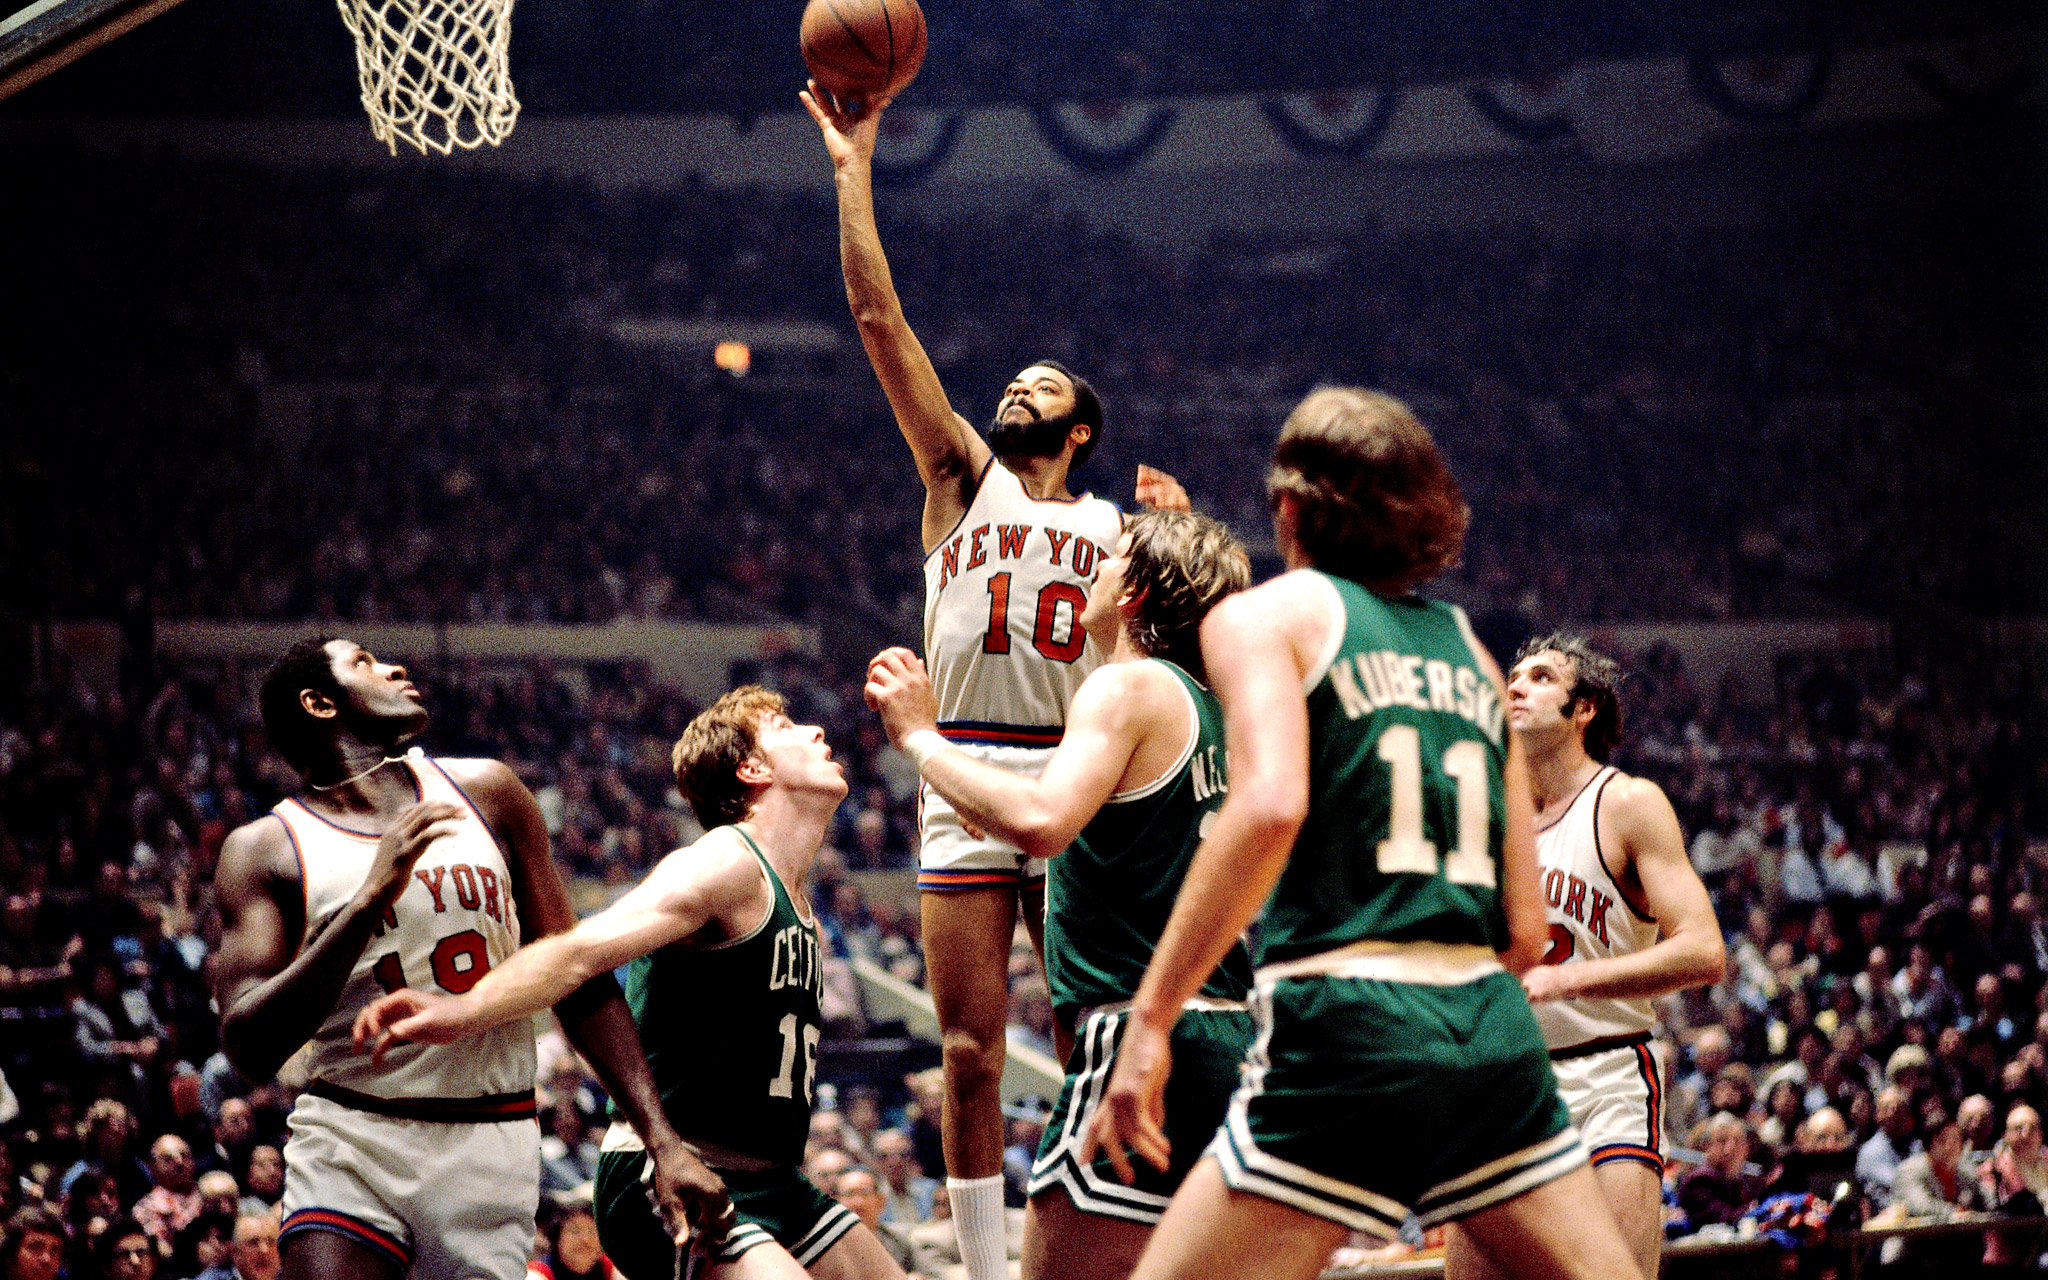 1. Walt Frazier - The 25 Greatest Knicks - ESPN